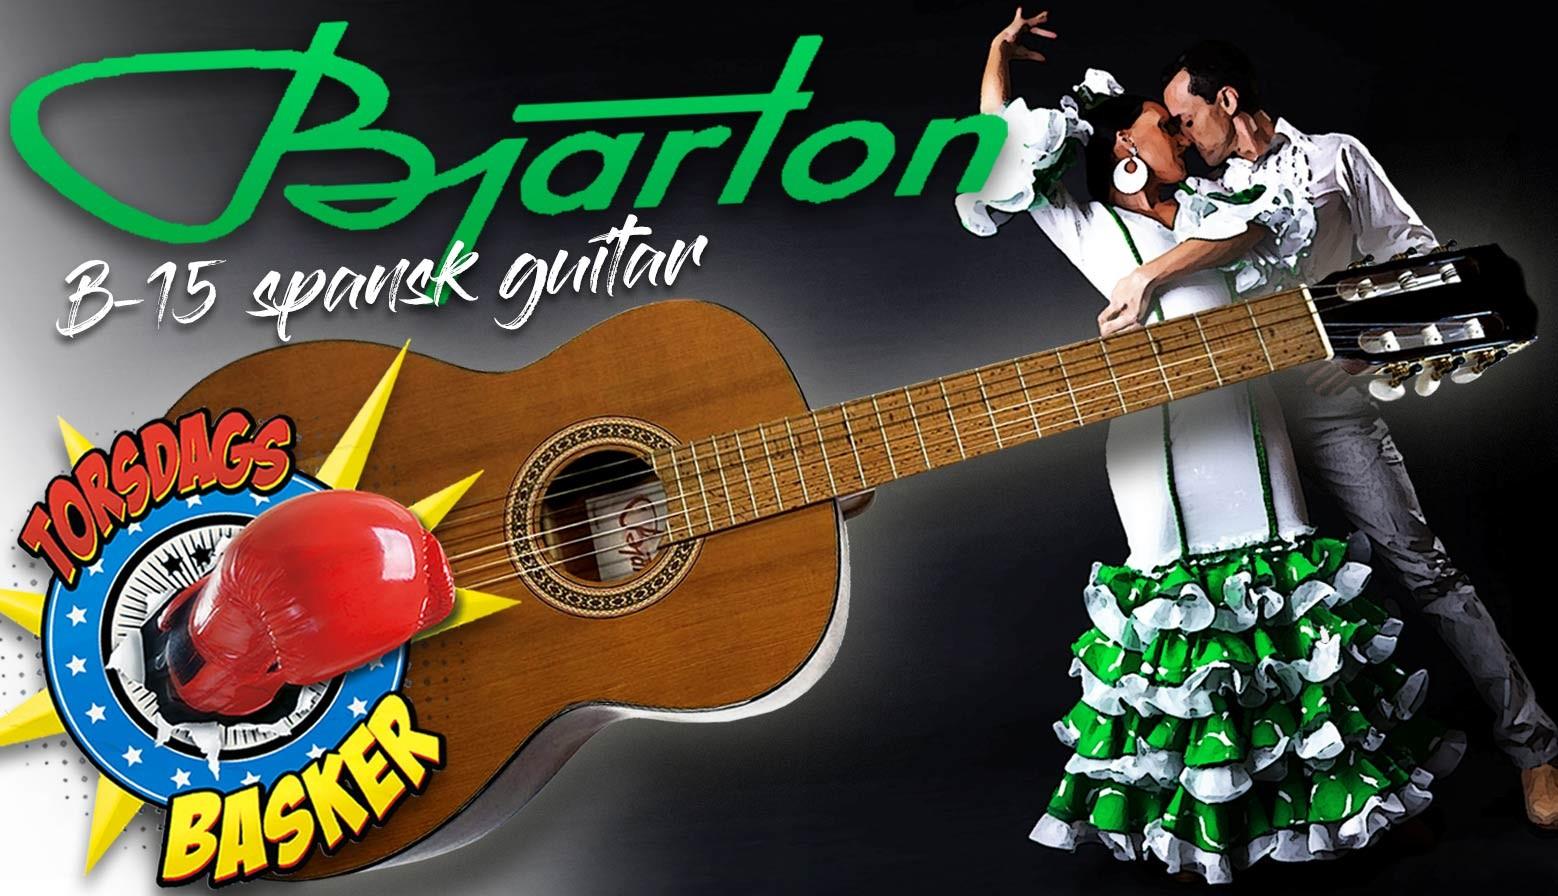 Bjarton banner